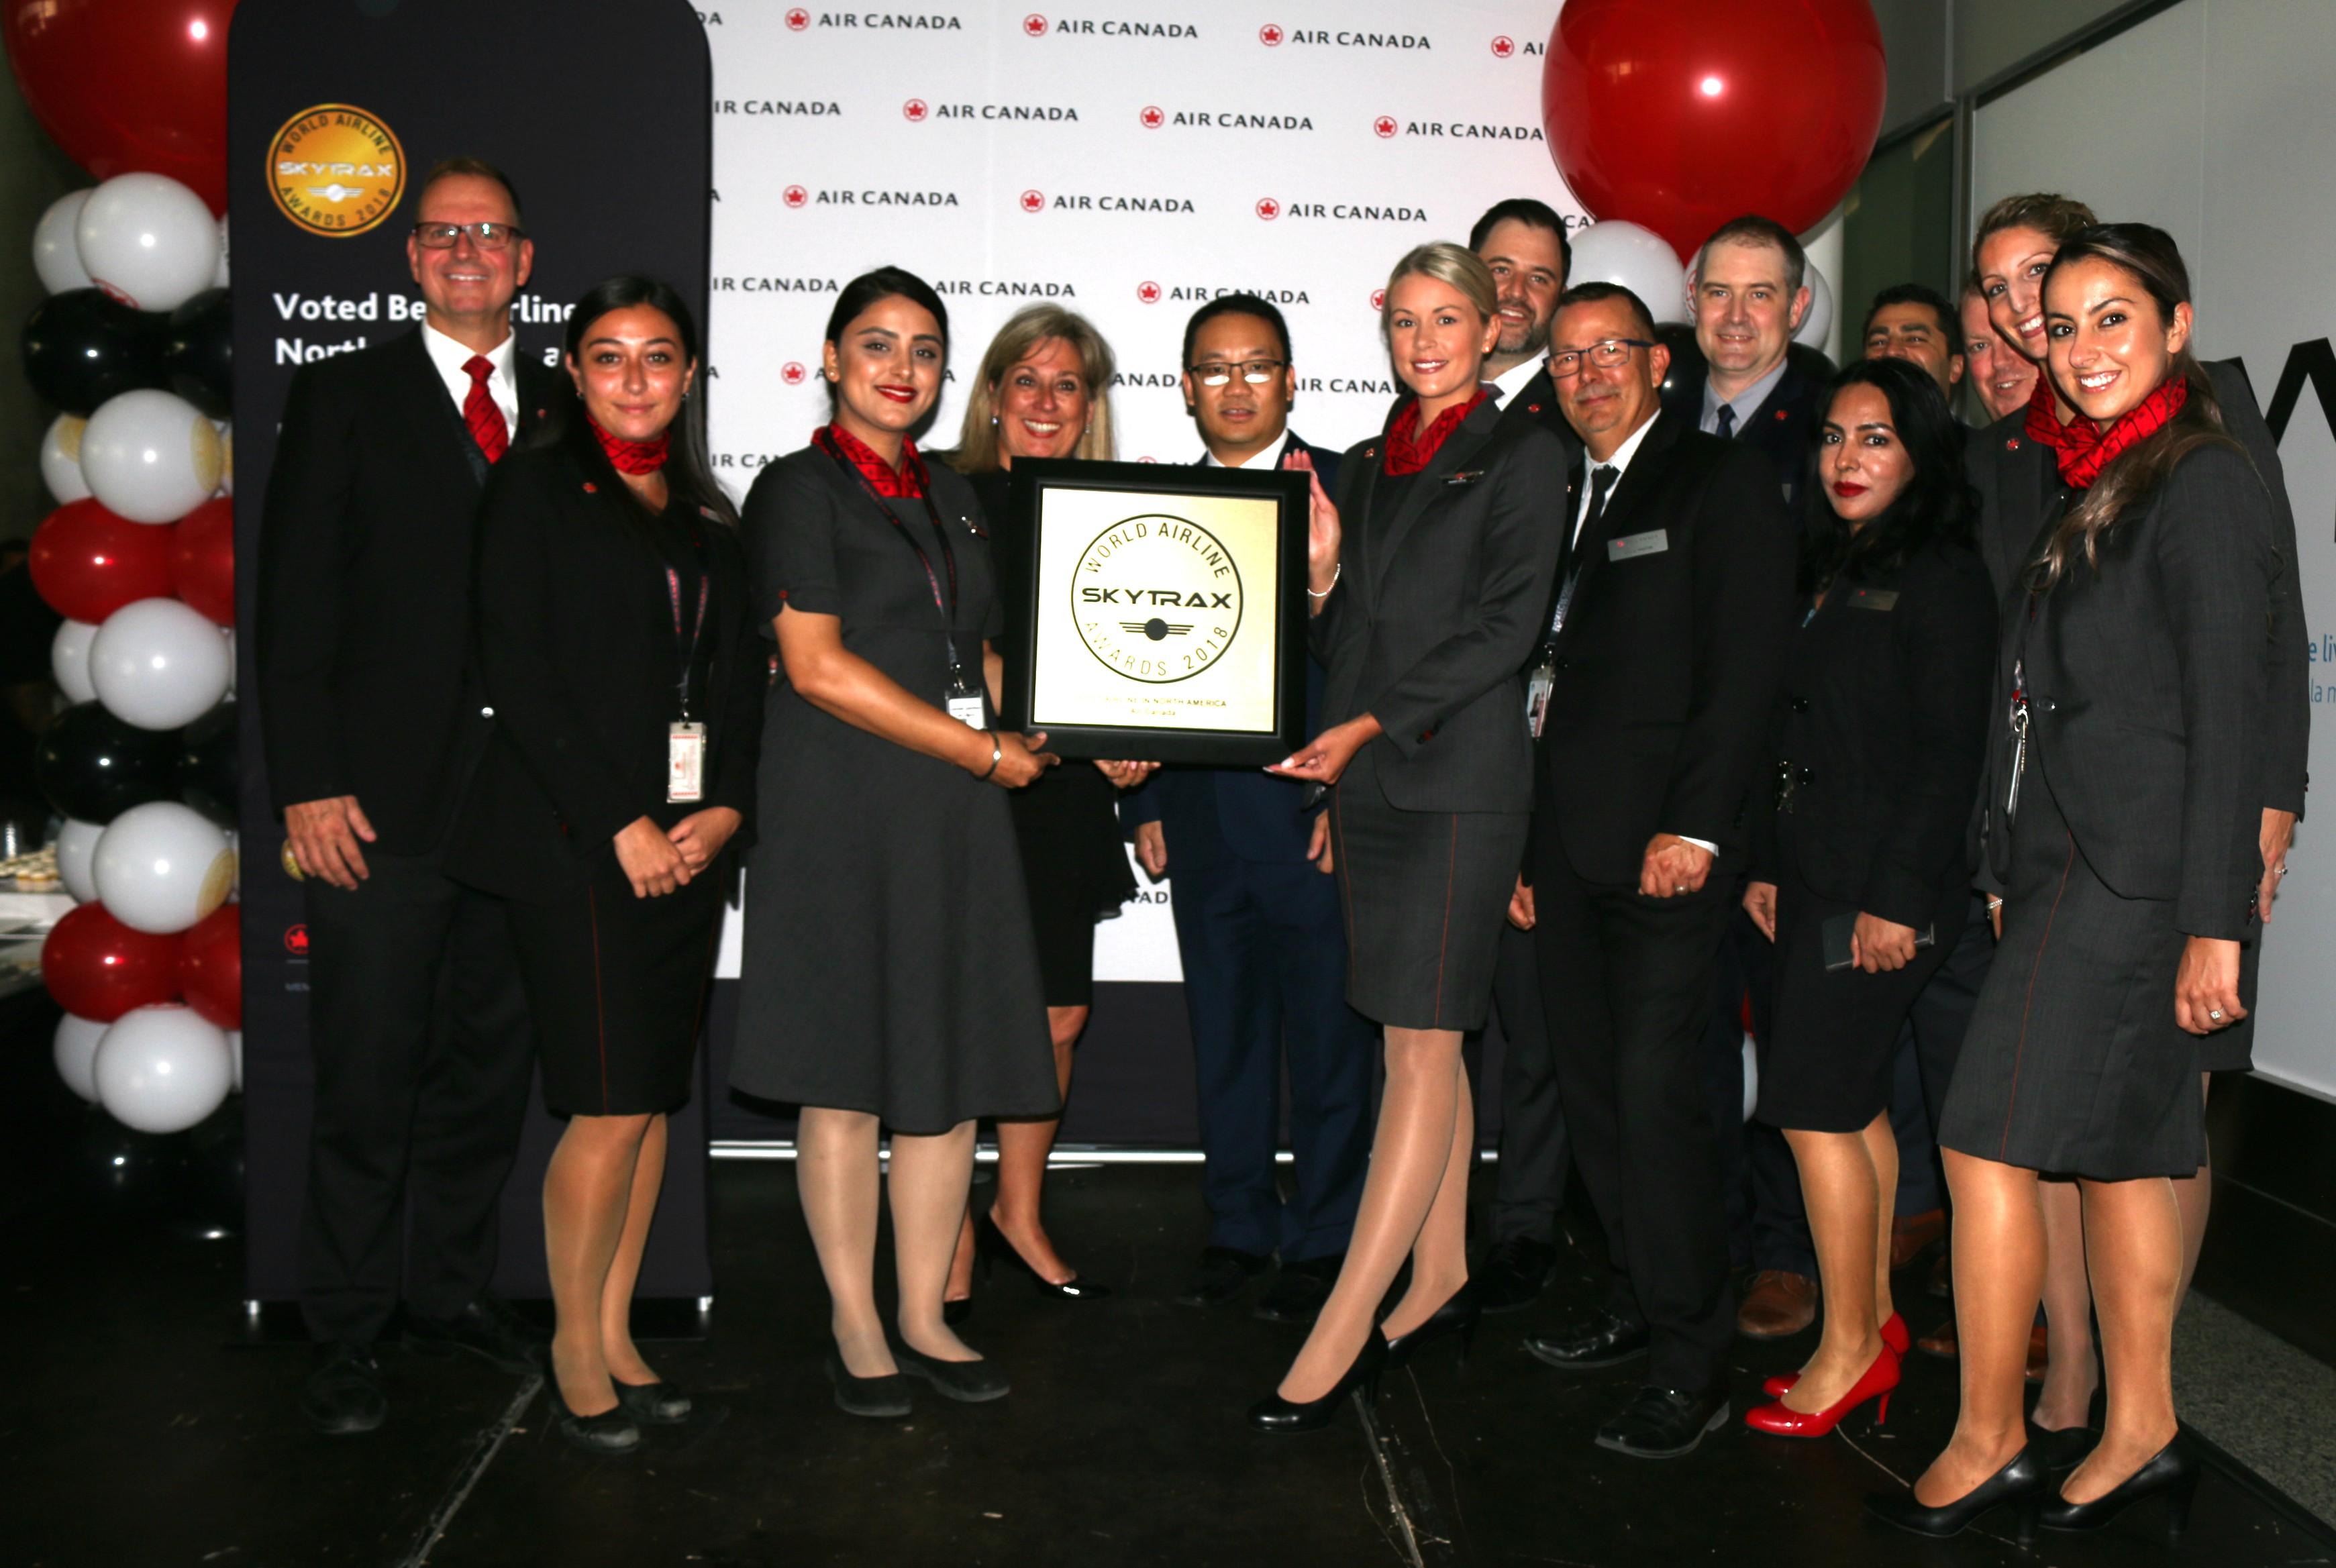 Air Canada executives show off Skytrax award